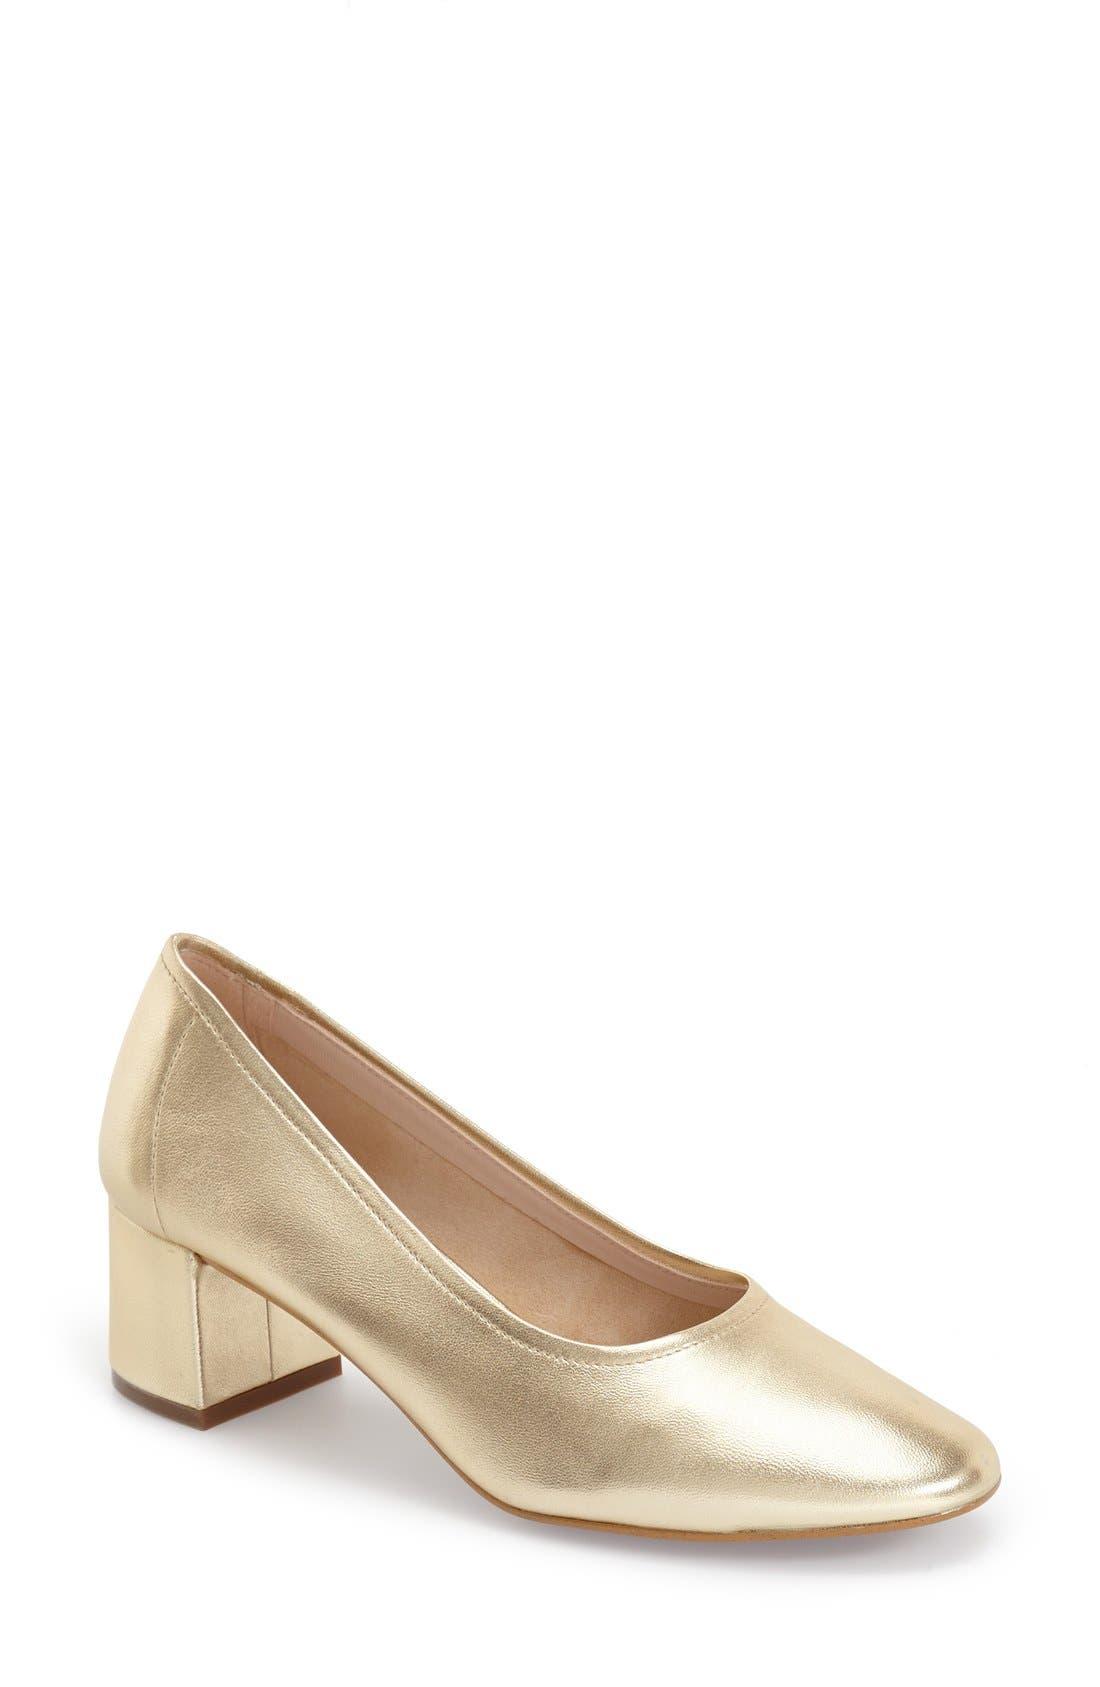 TOPSHOP Juno Ballet Shoe